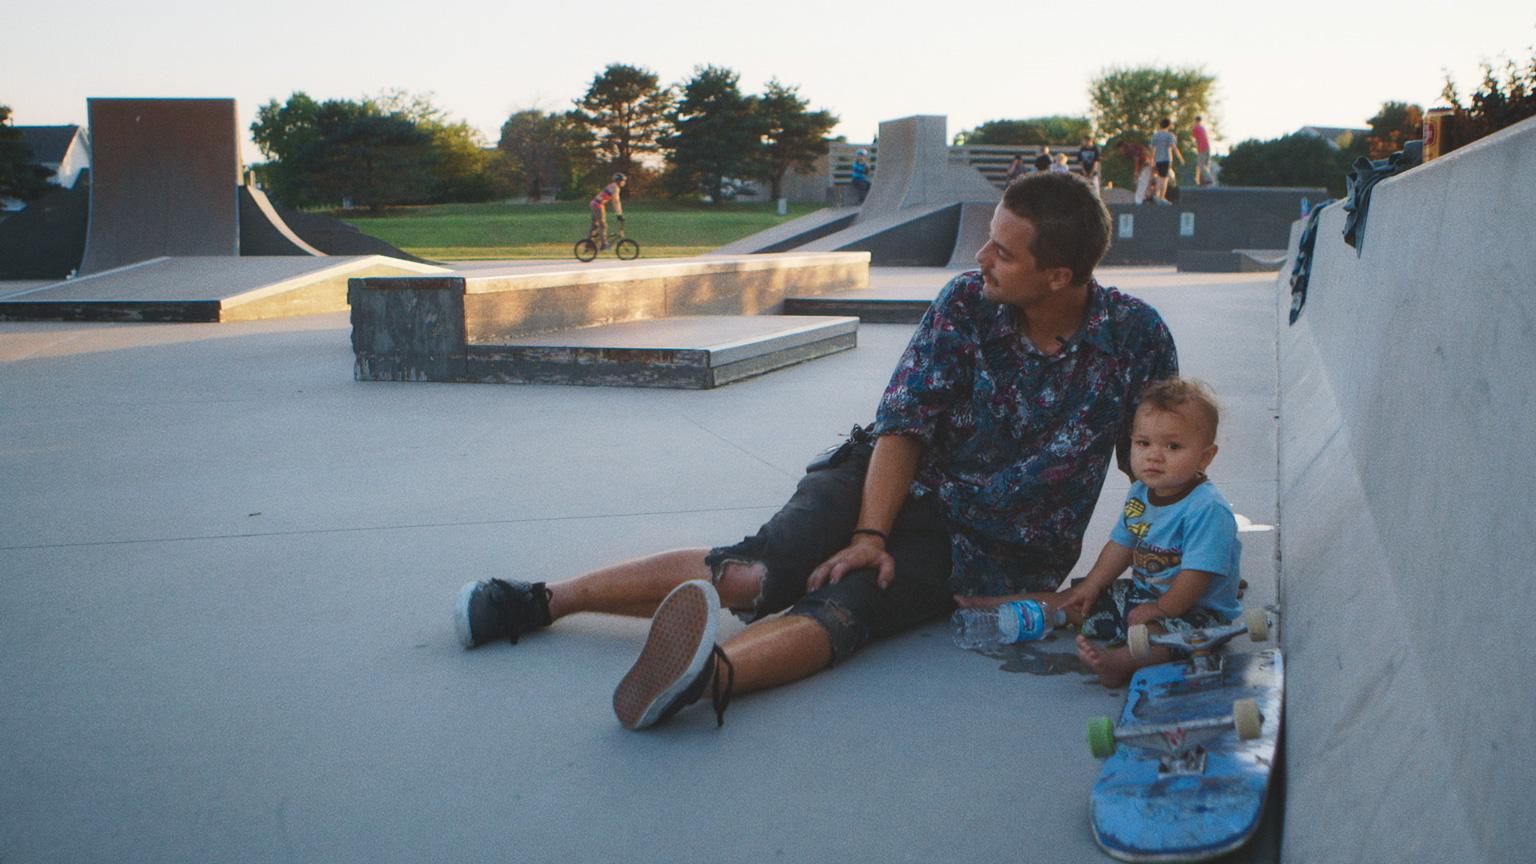 MTG-Zack-&-Elliot-skatepark-looking-out.jpg